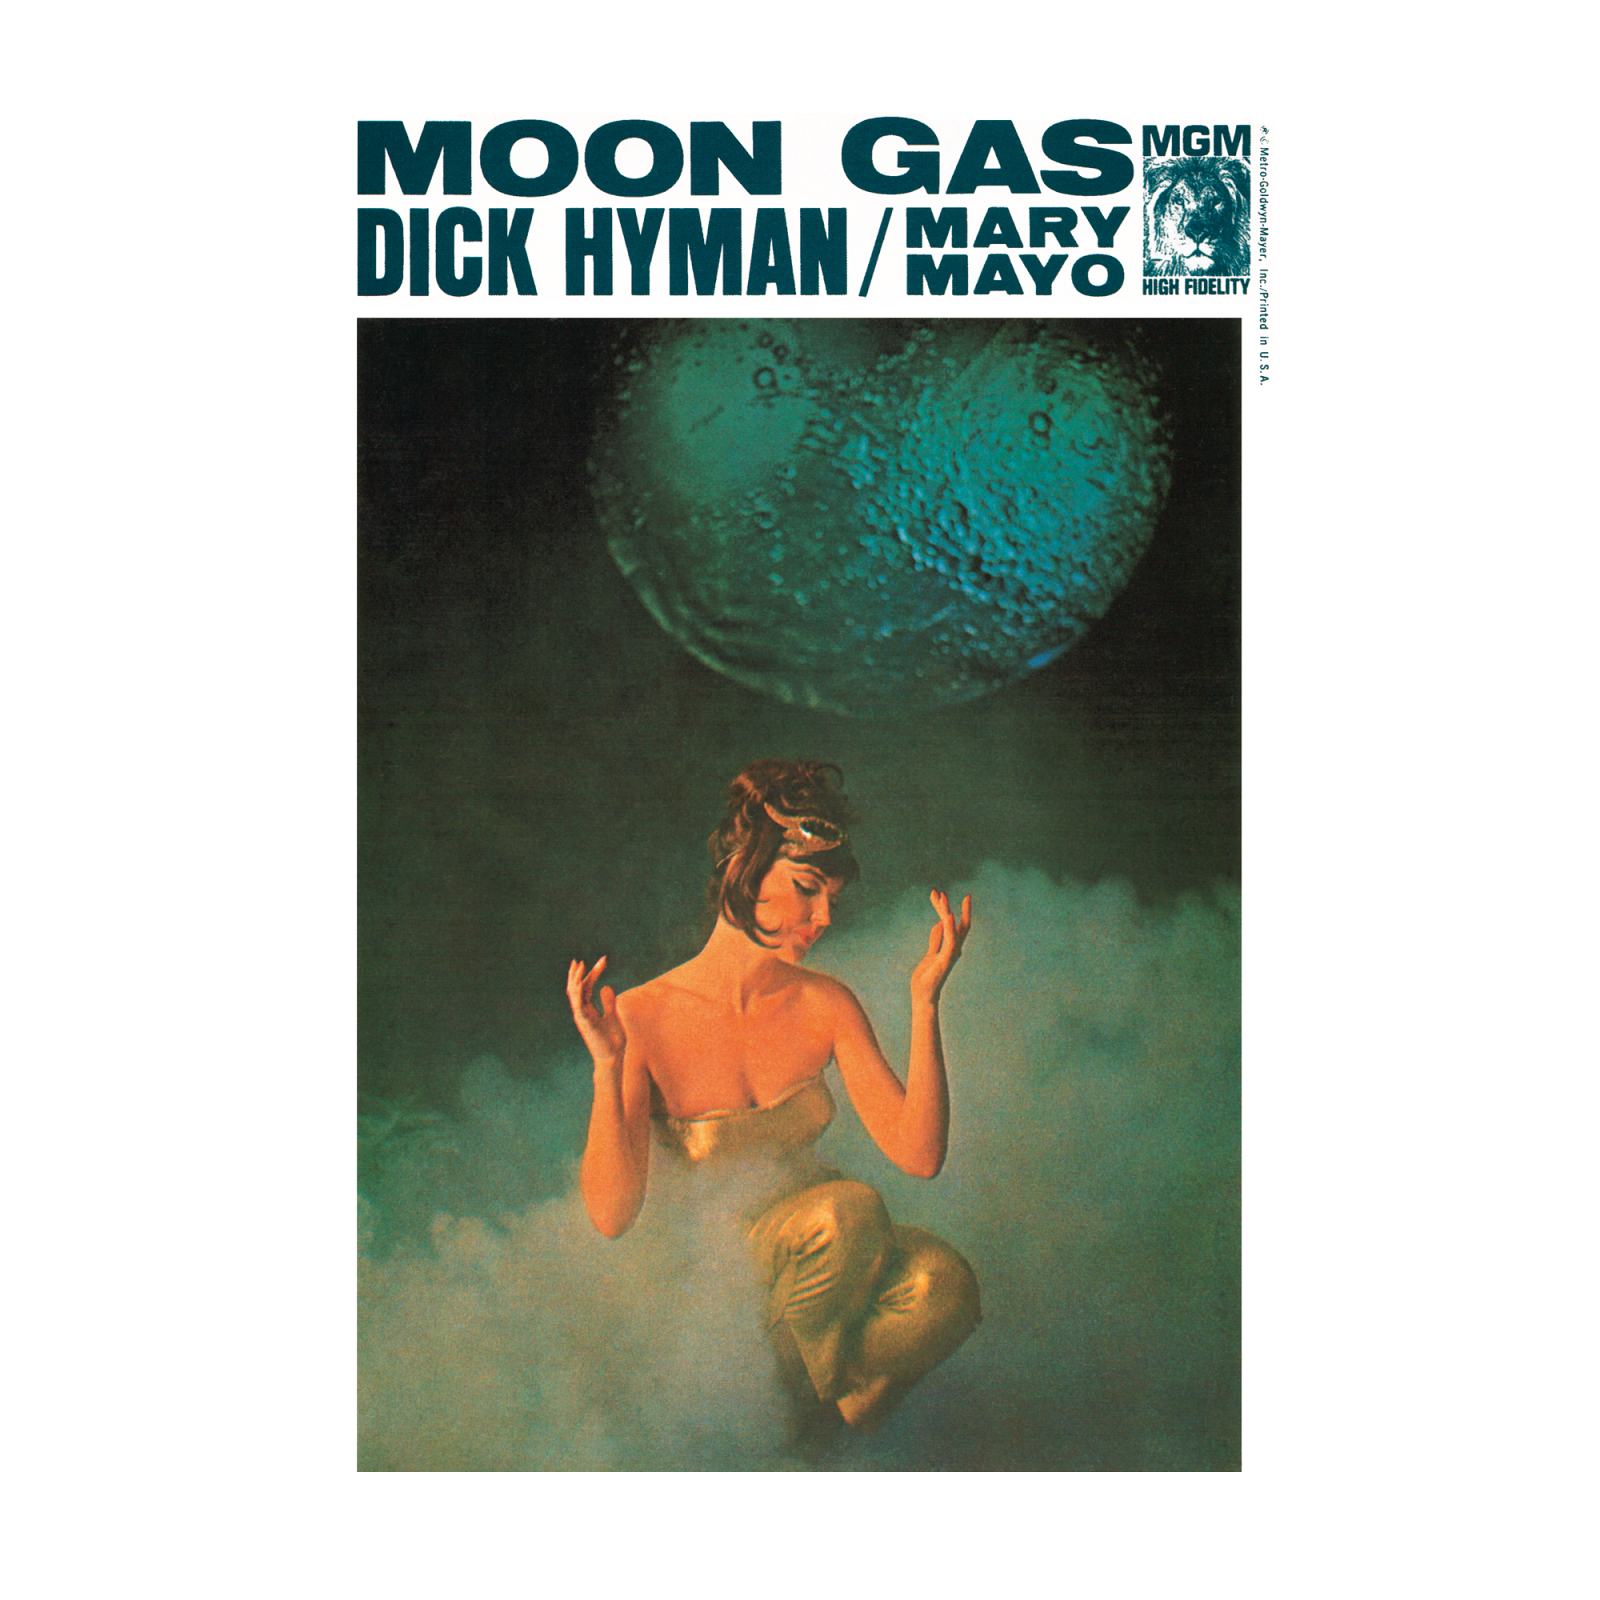 Stereo Candies: DICK HYMAN / MARY MAYO